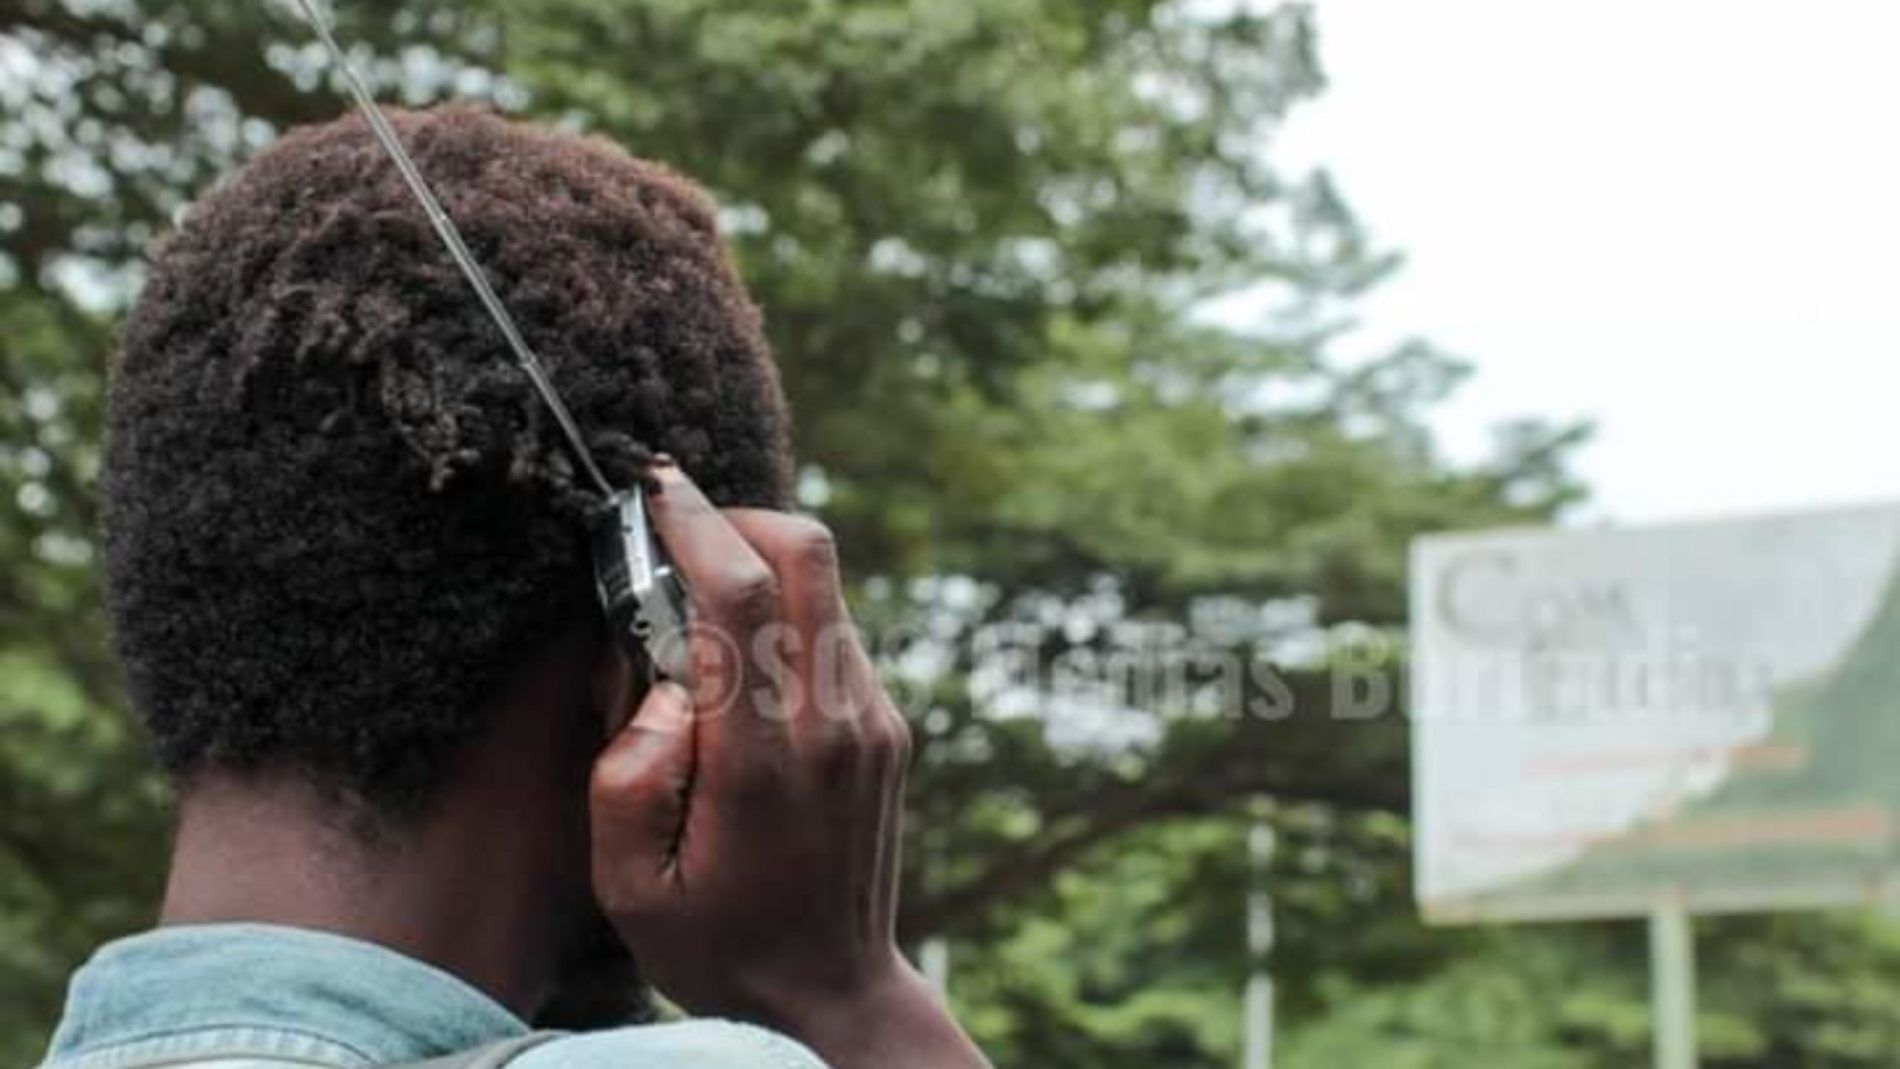 Busiga : interdiction d'écouter la VOA et les radios rwandaises